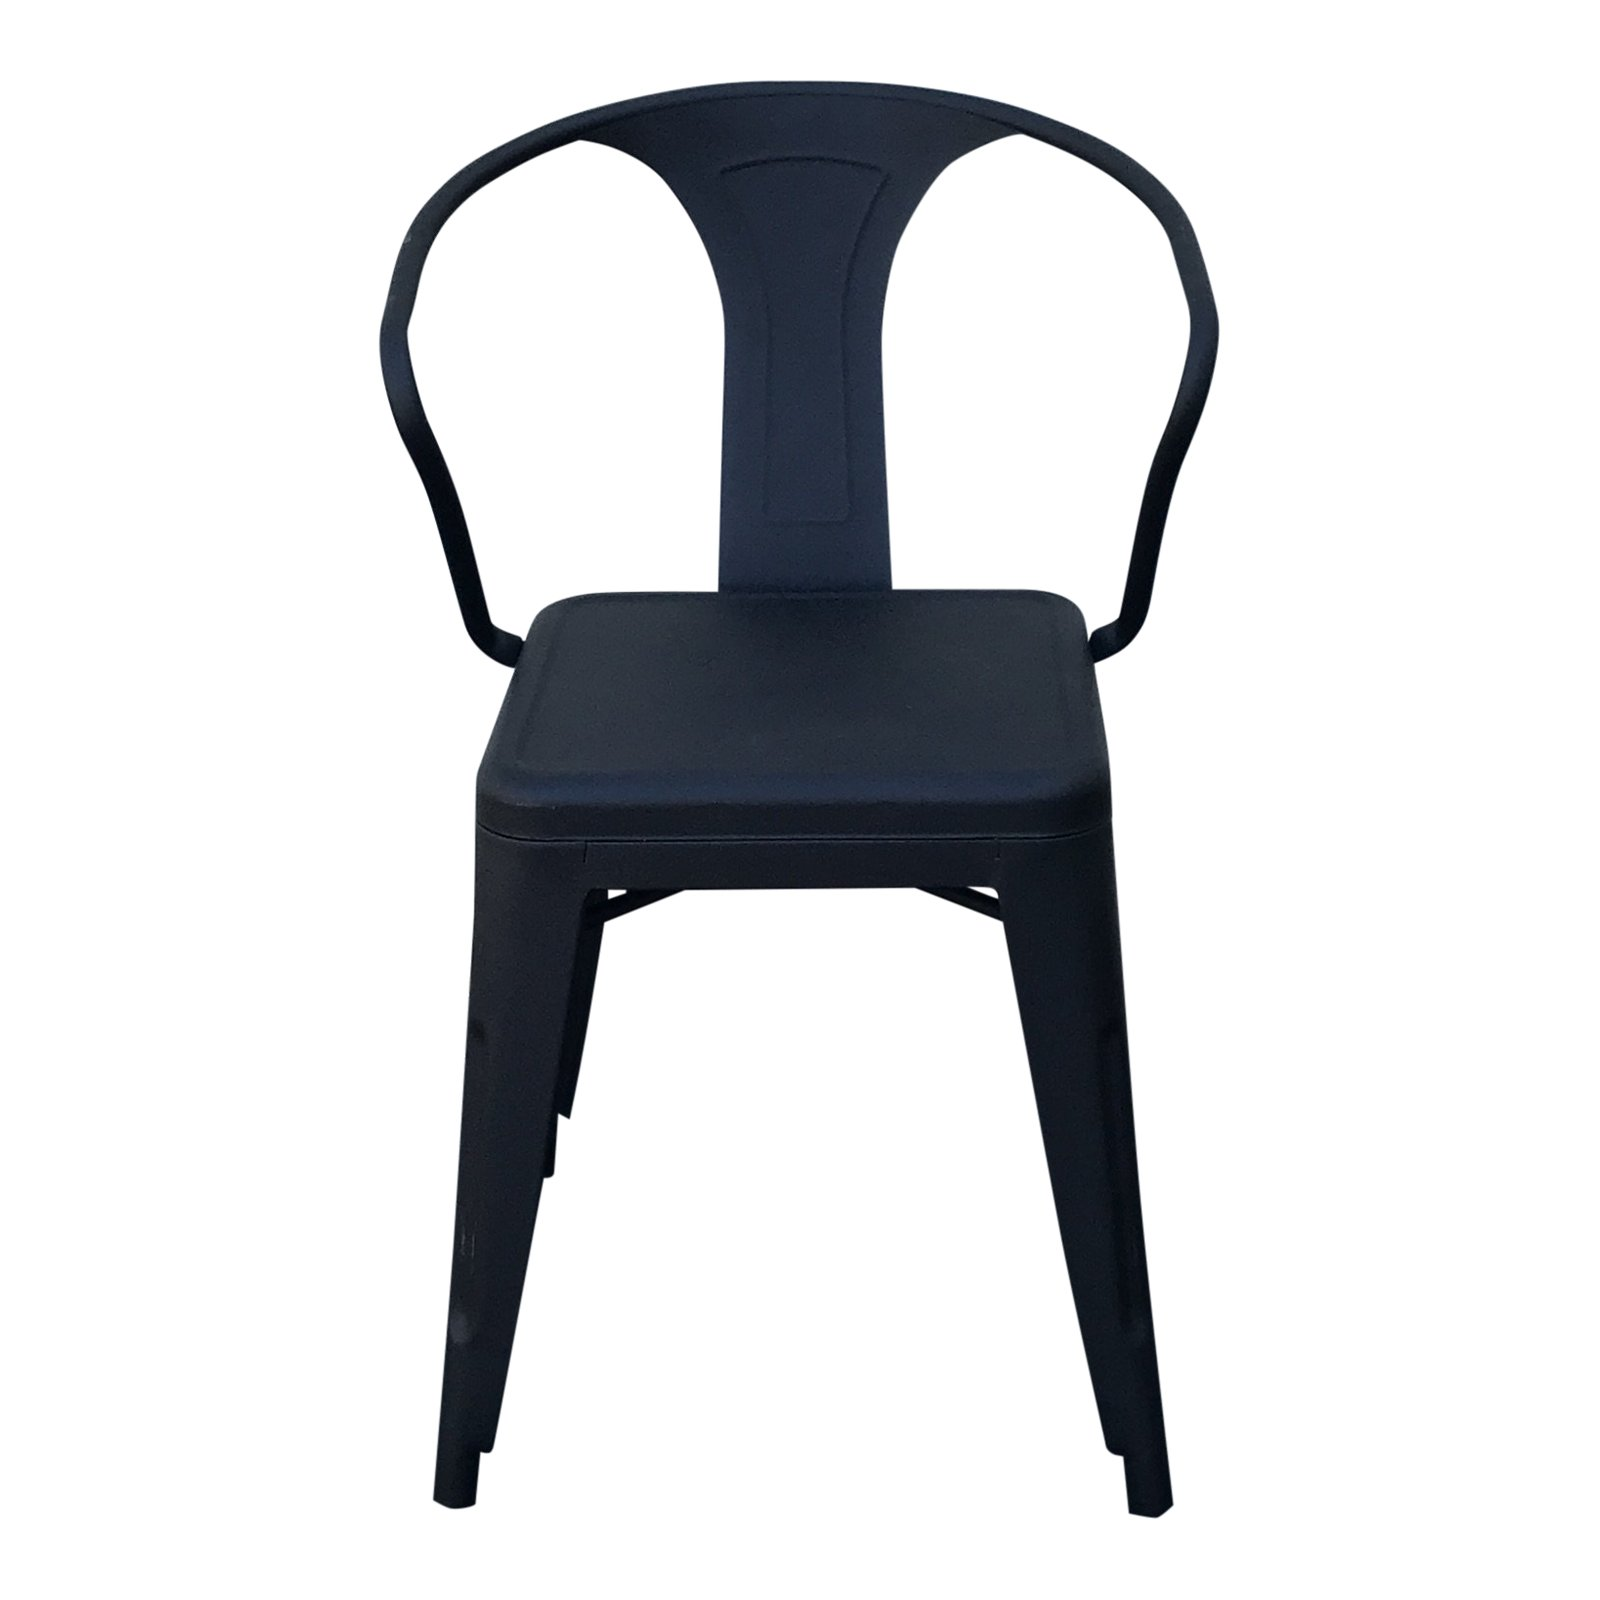 industrial-matte-black-metal-tub-tolix-dining-chair-0926.jpg